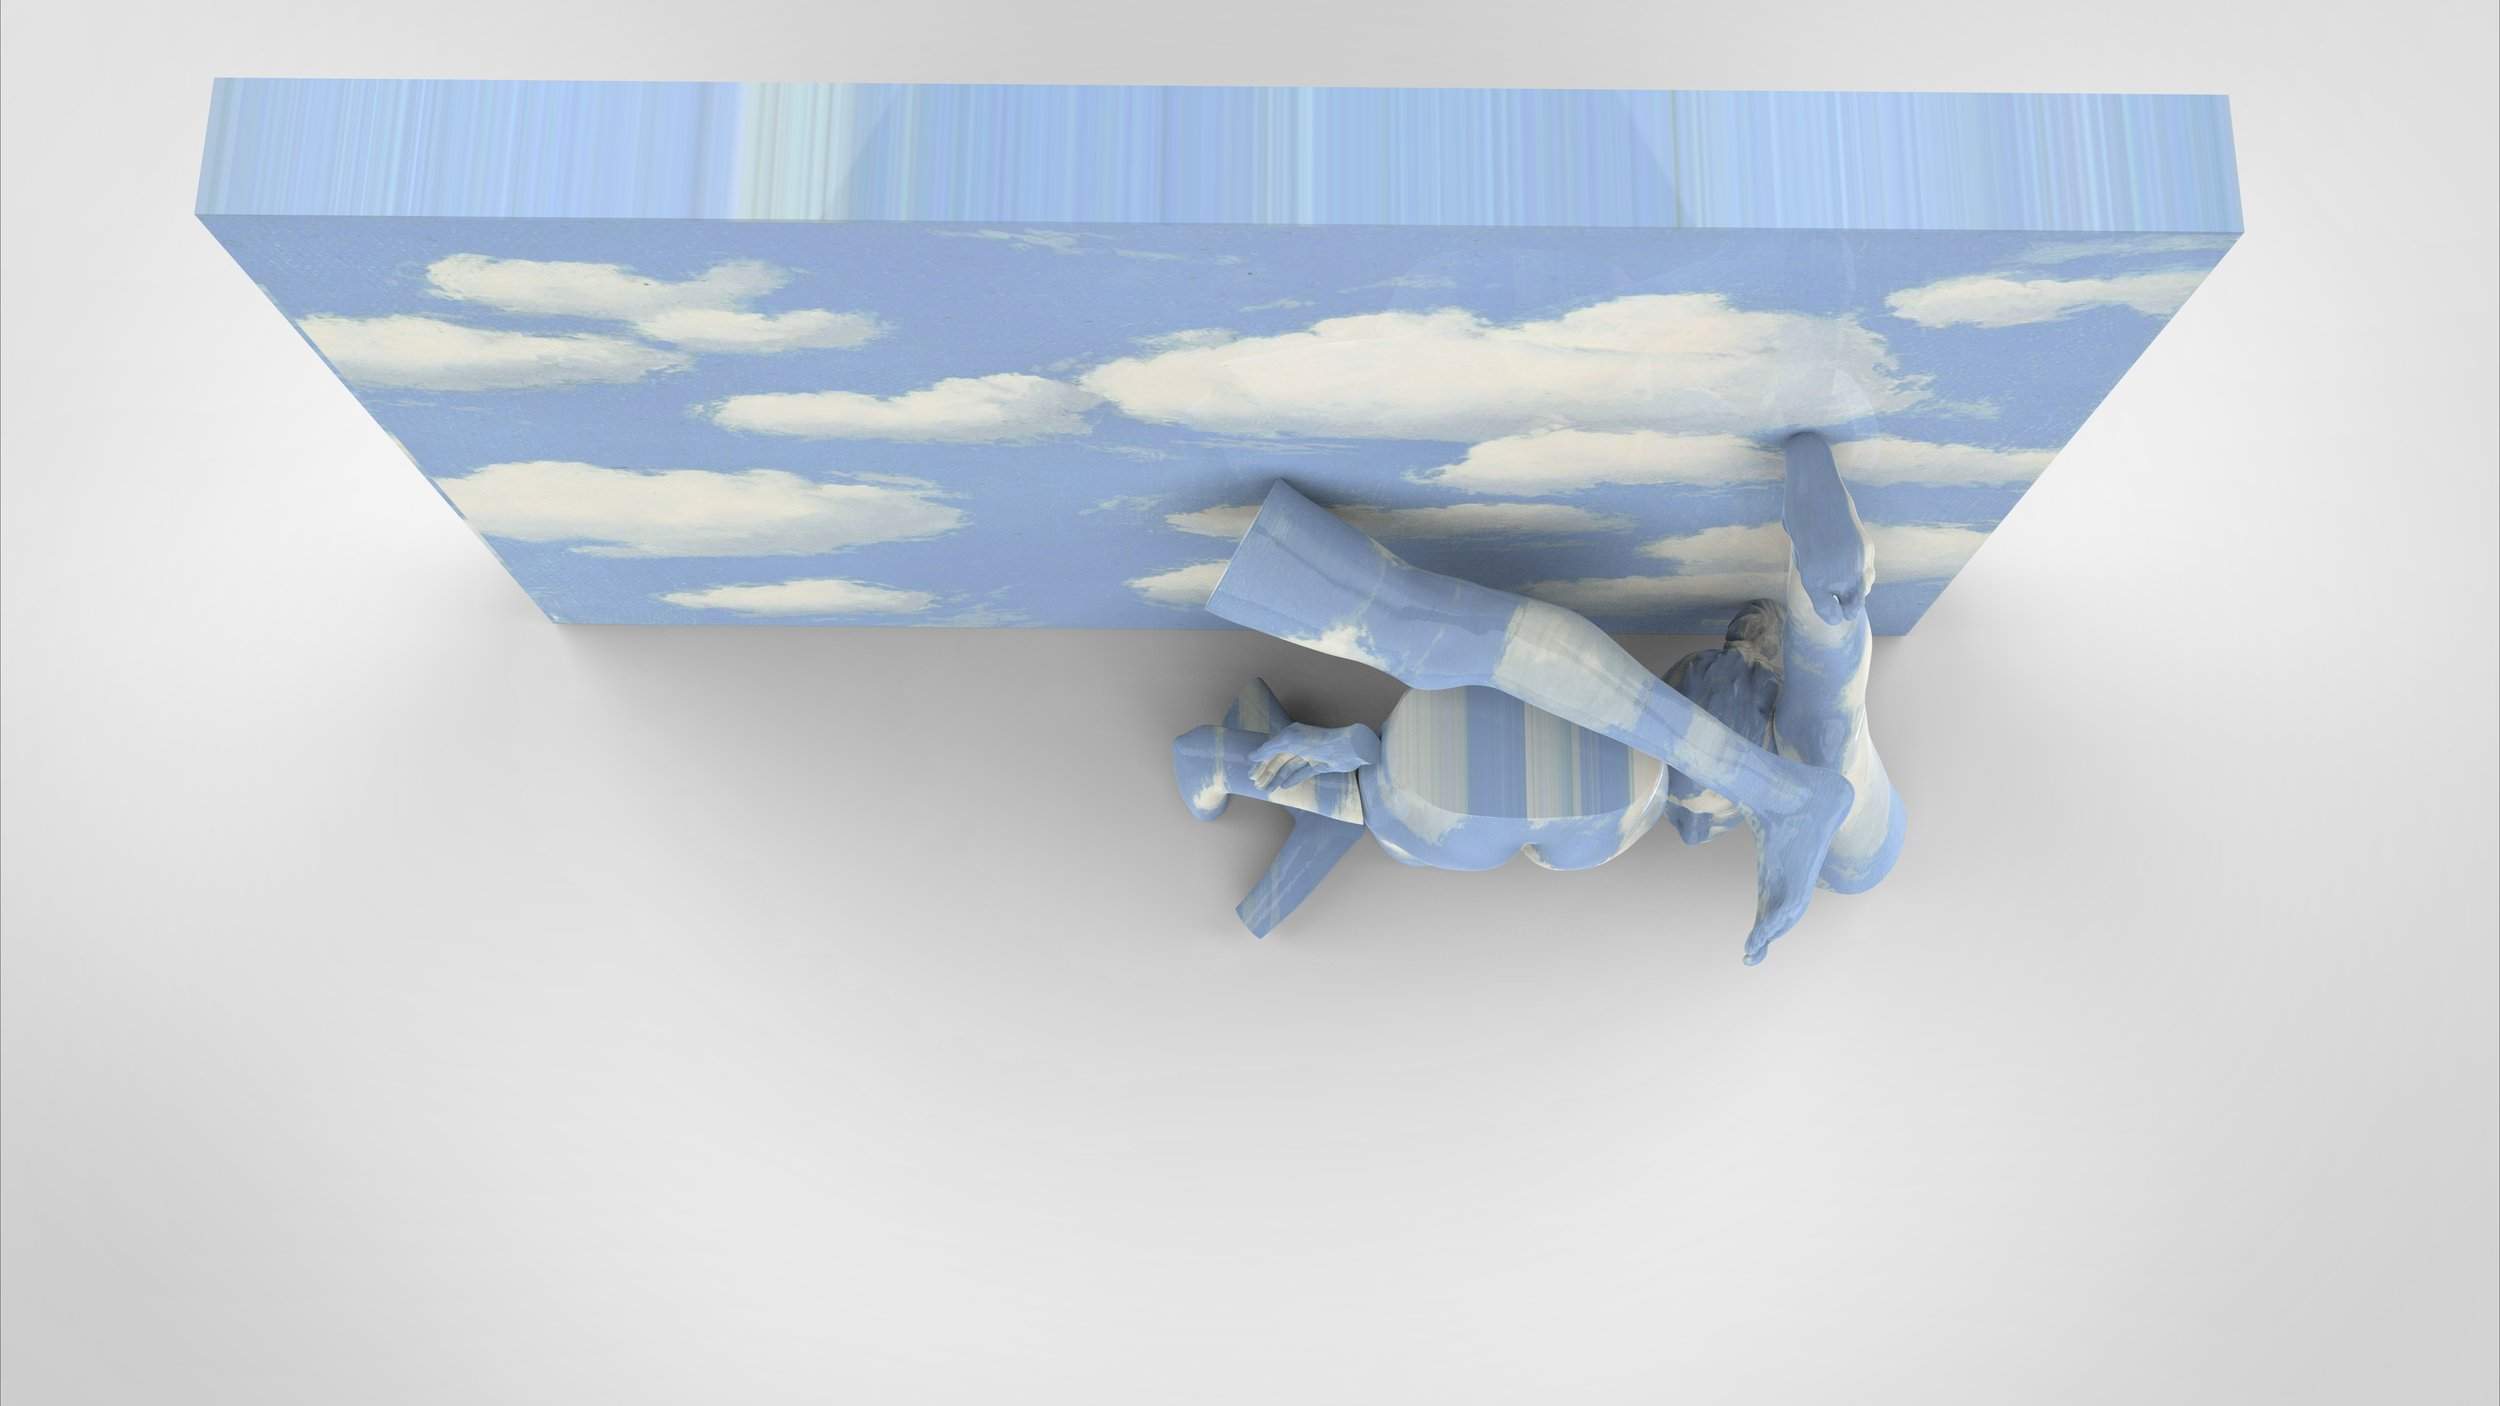 magritte_render_1.8 (1).jpg